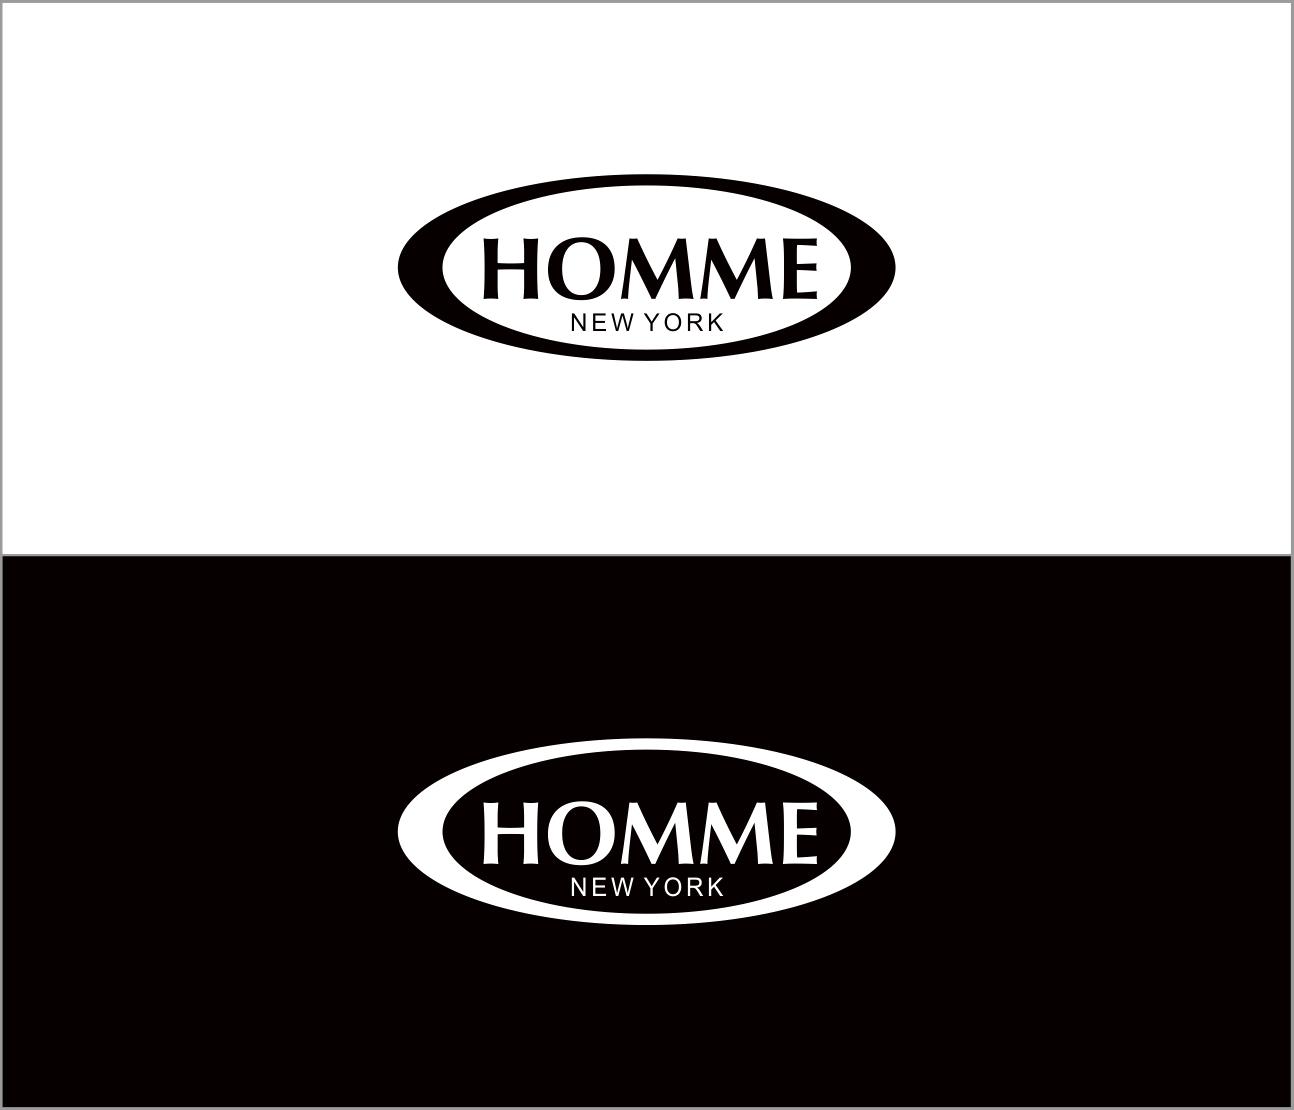 Logo Design by Armada Jamaluddin - Entry No. 36 in the Logo Design Contest Artistic Logo Design for HOMME | NEW YORK.